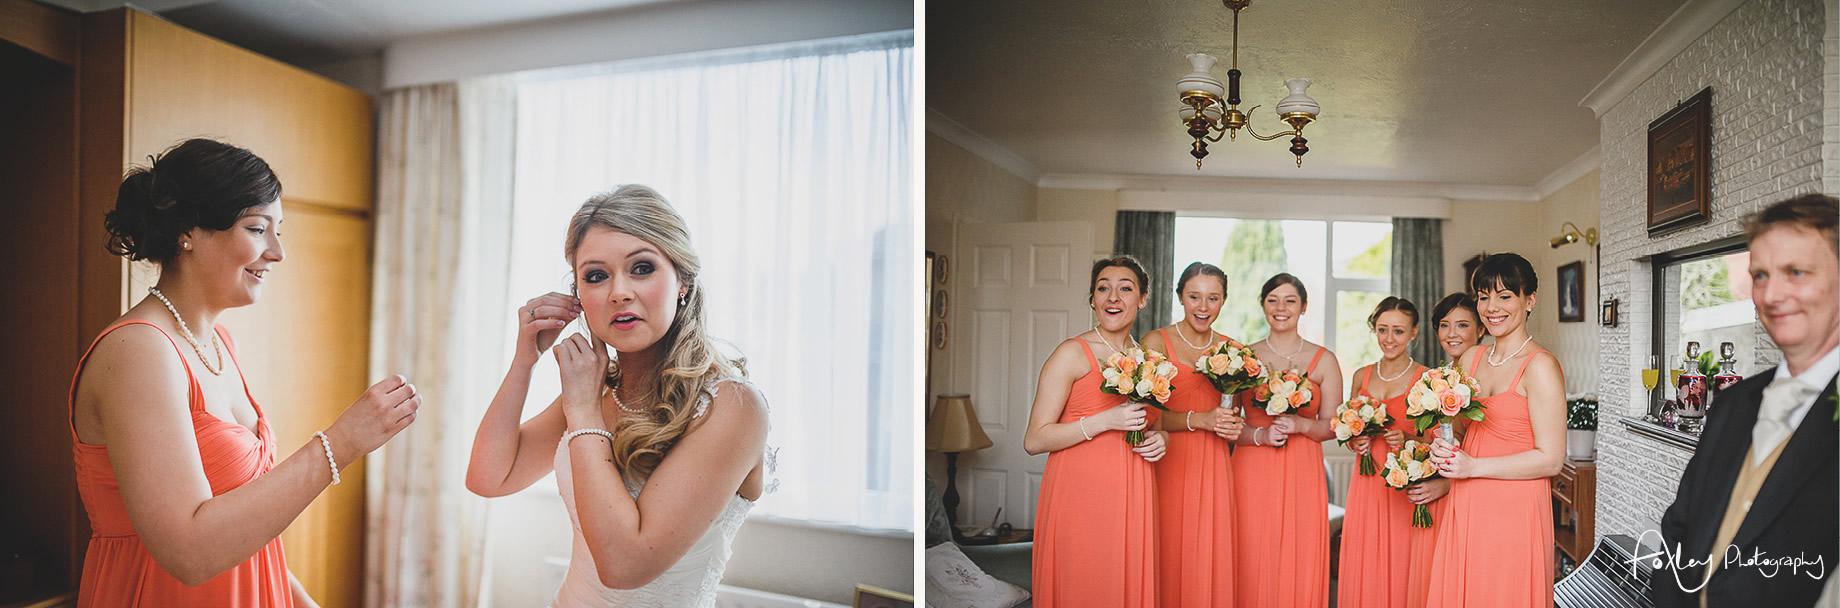 Gemma and Lewis' Wedding at Mitton Hall 055